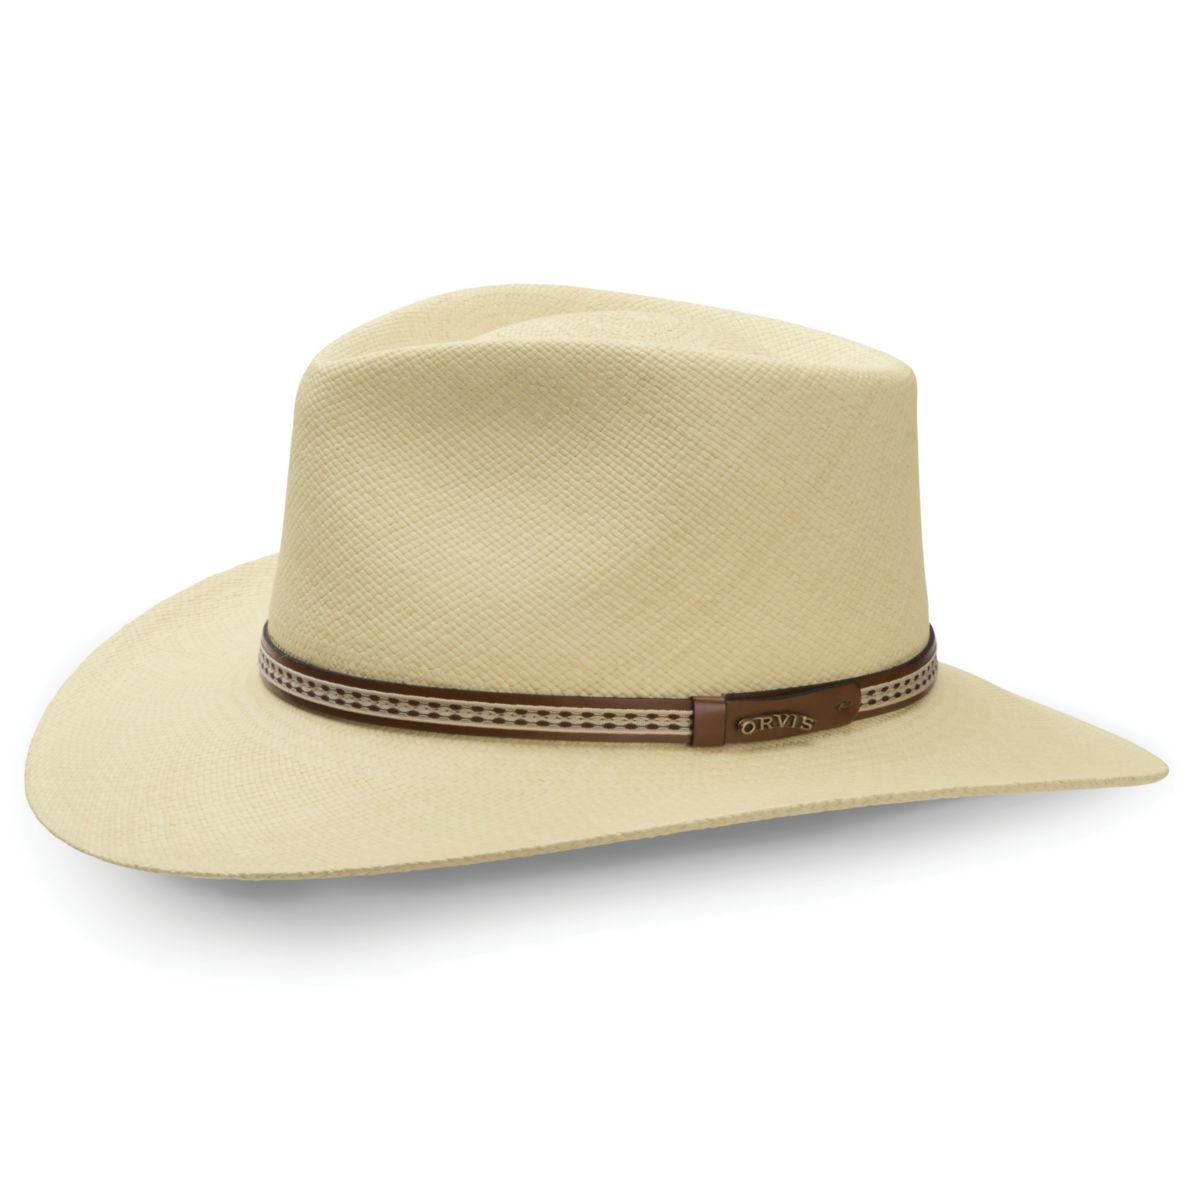 Walnut Creek Genuine Panama Hat - NATURALimage number 0